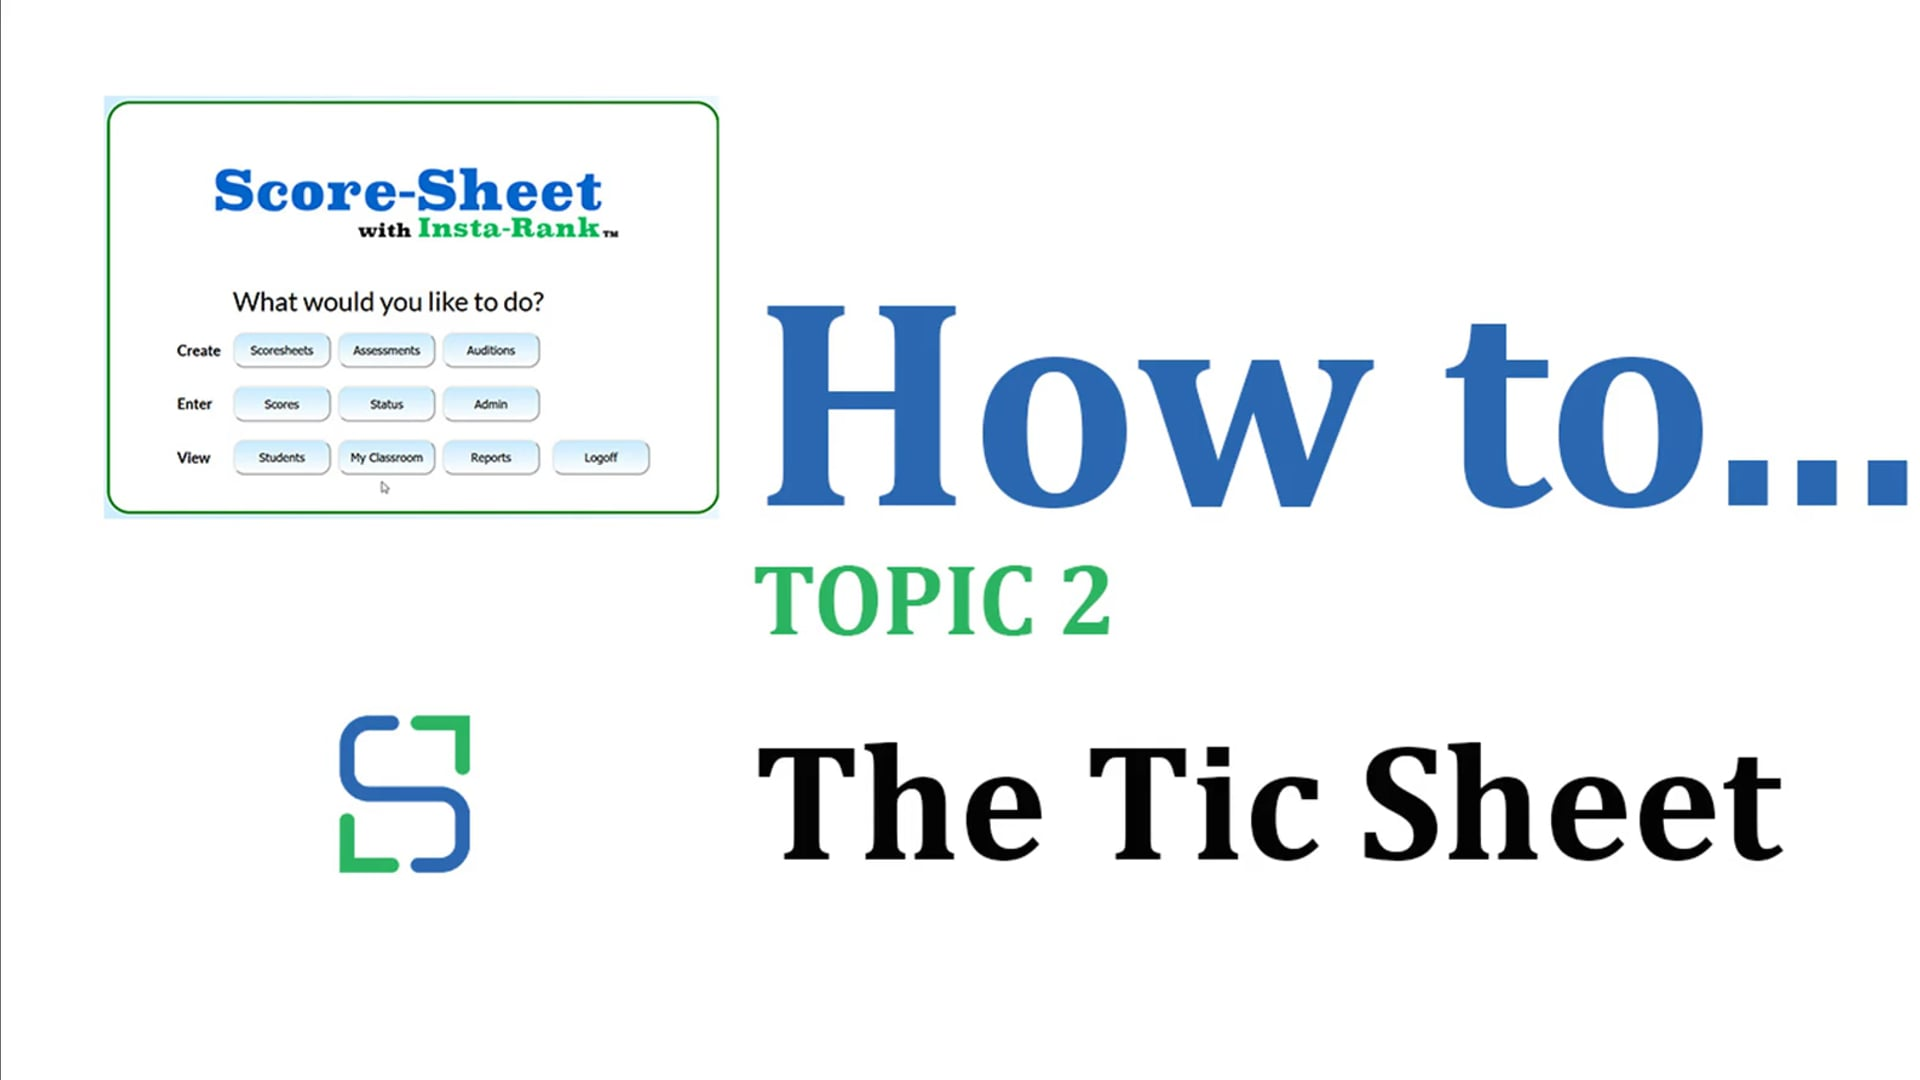 11 - THE TIC SHEET